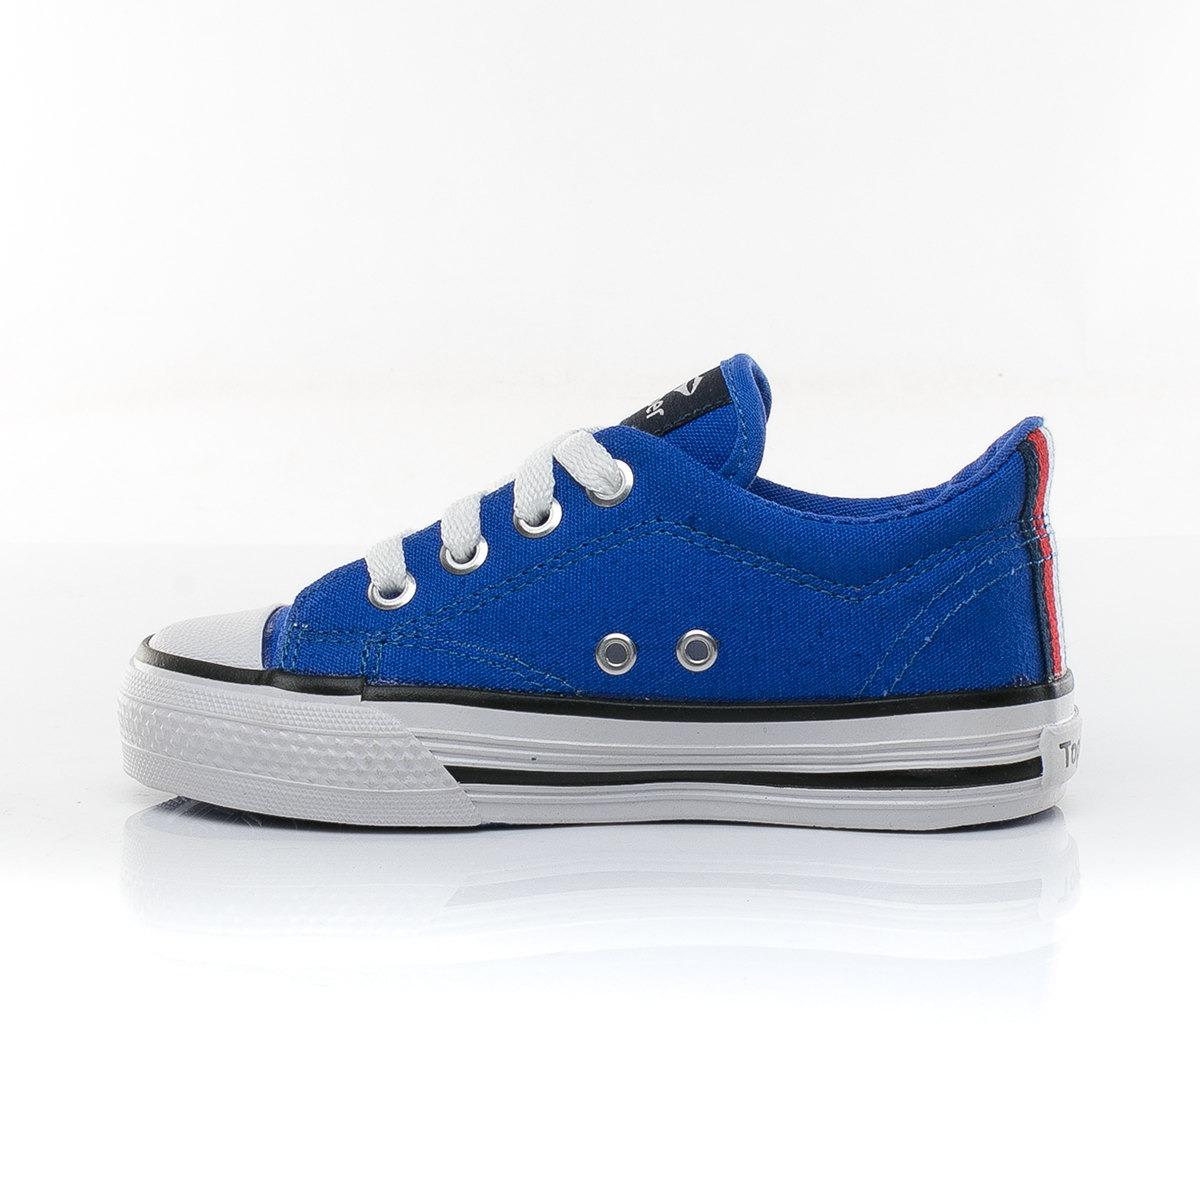 429d77a009 Cargando zoom... niños topper zapatillas. Cargando zoom... zapatillas derby  niños + topper sport 78 tienda oficial